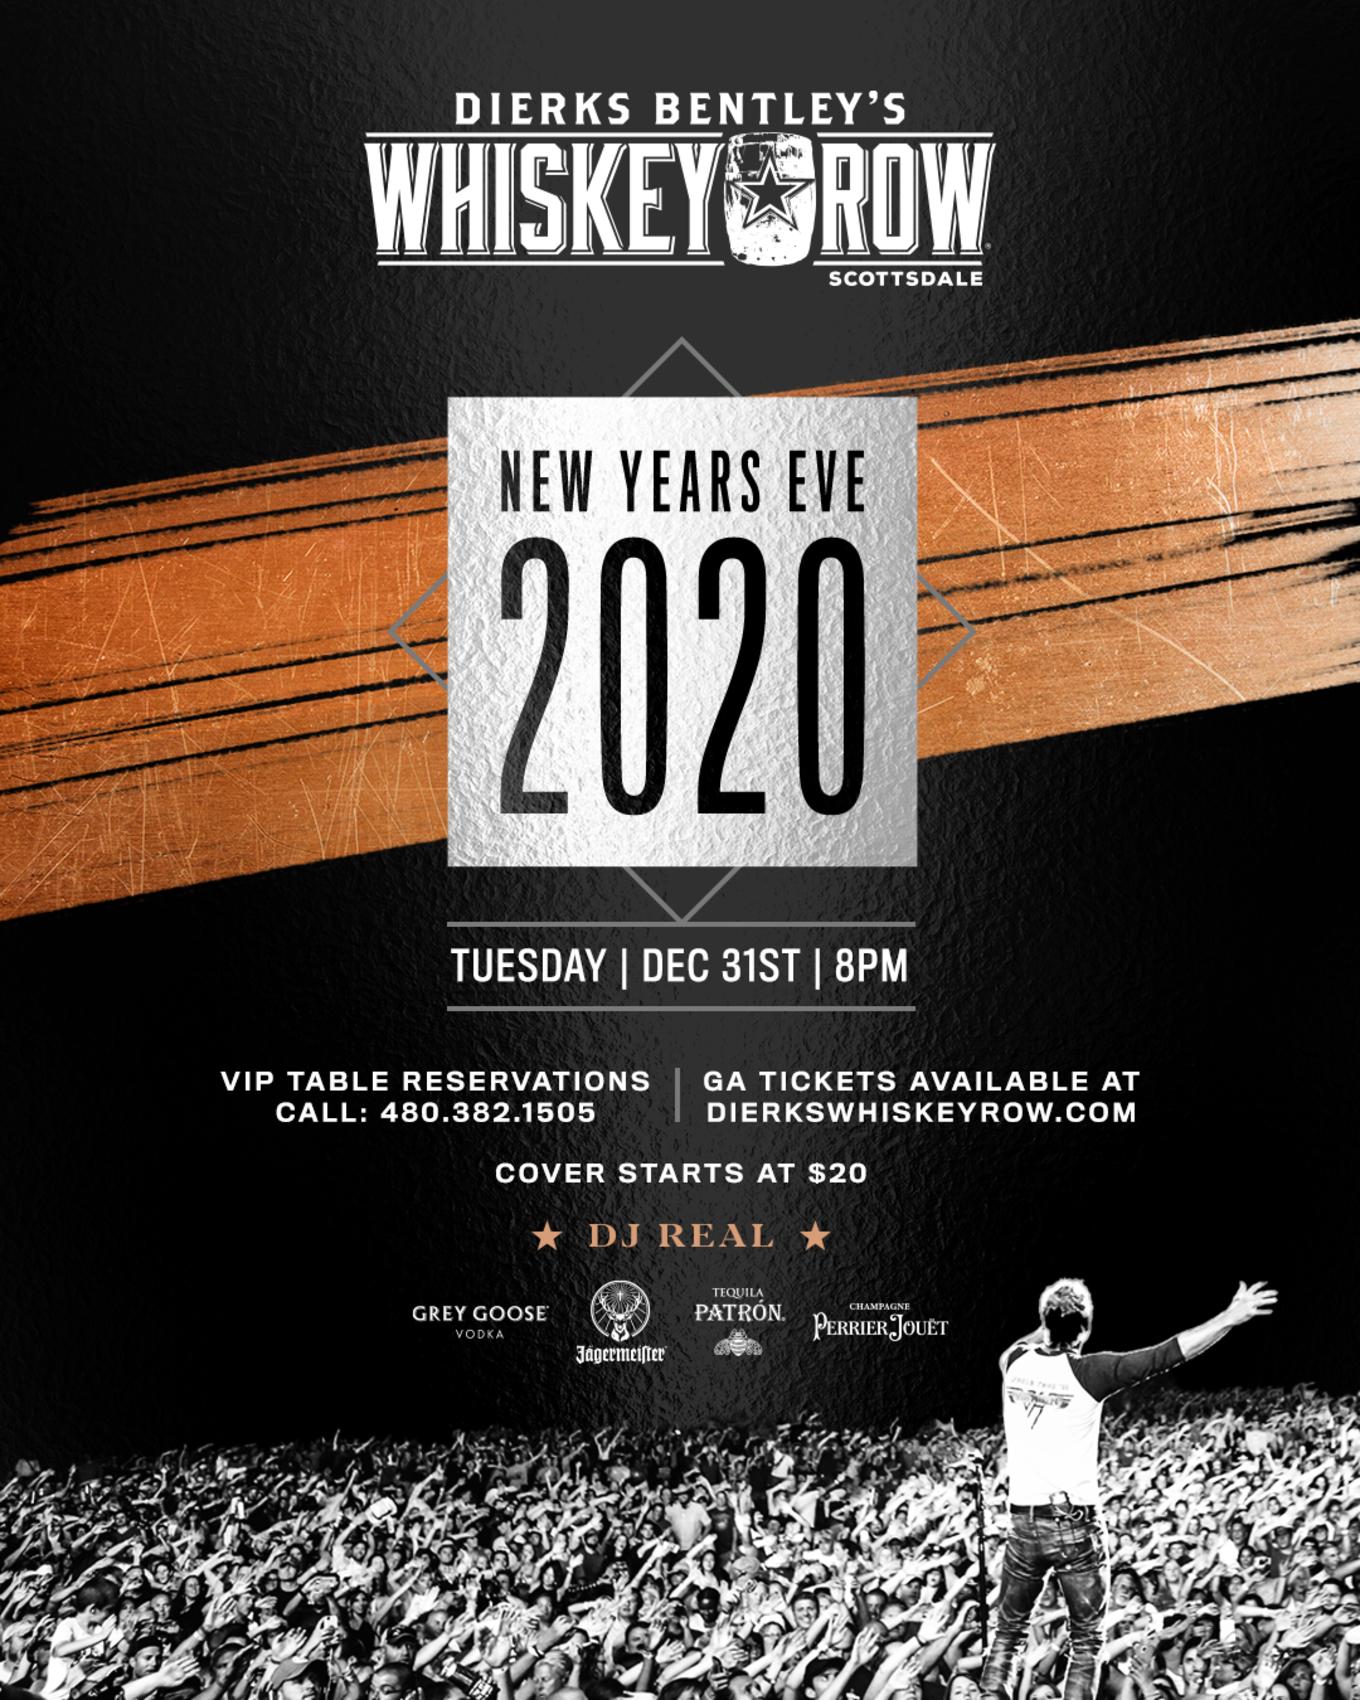 Dierks Bentley Tour 2020.New Year S Eve 2020 Tickets Dierks Bentley S Whiskey Row